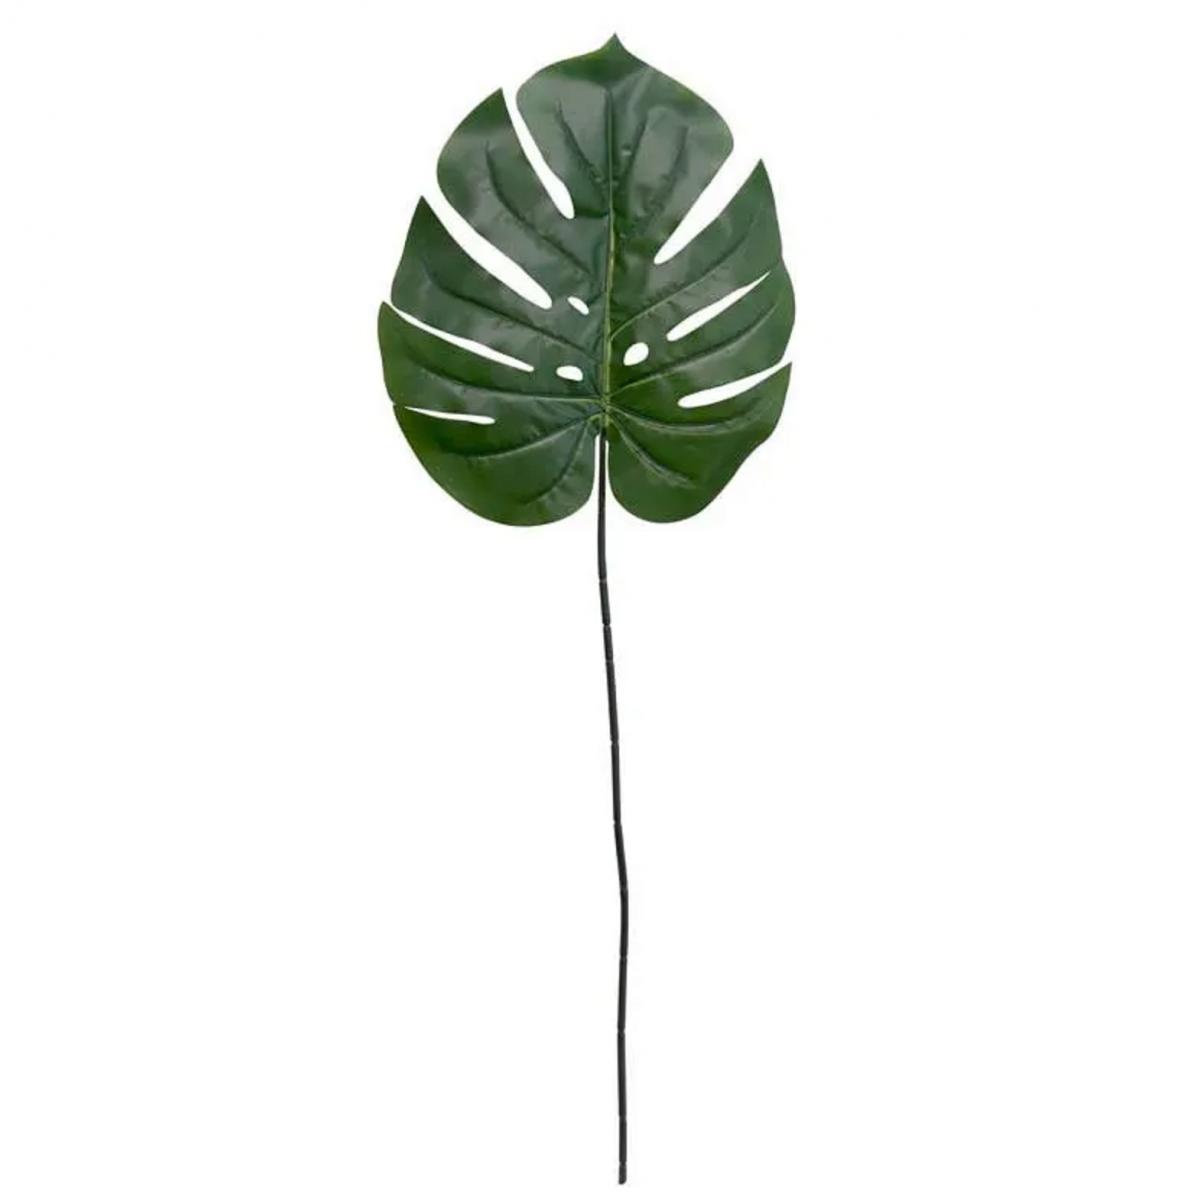 Realistica foglia di palma XL 100cm